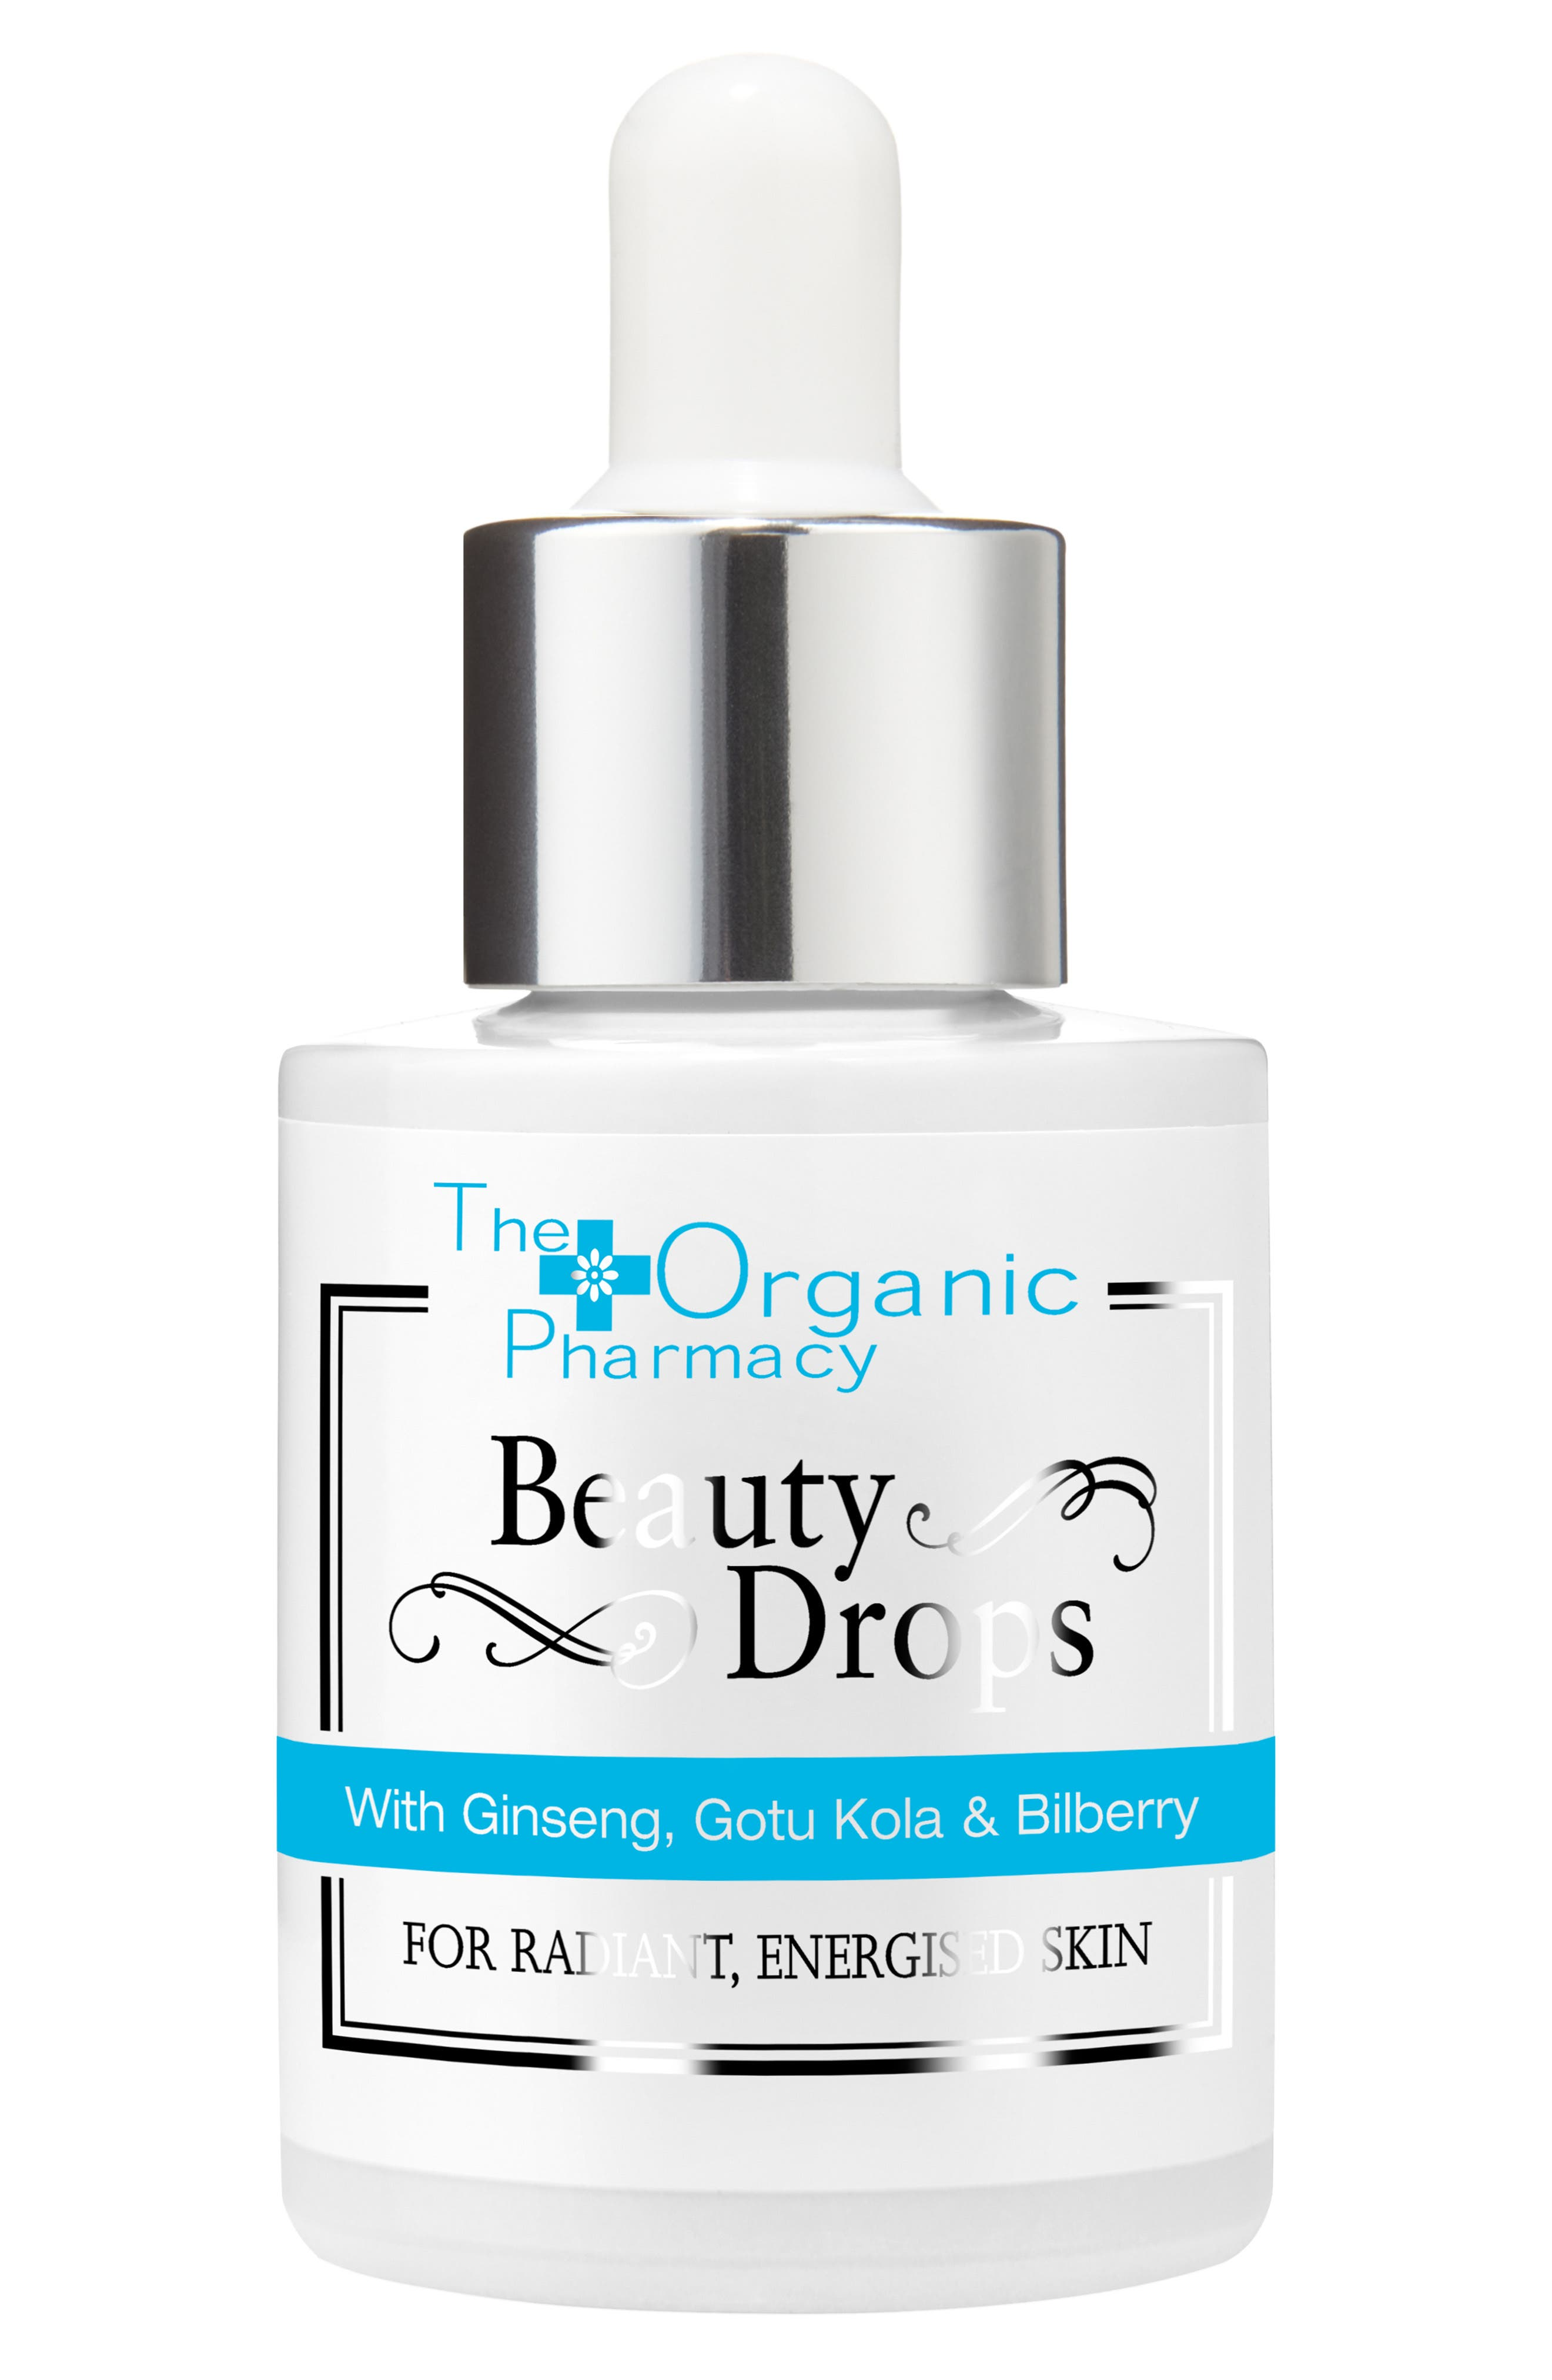 The Organic Pharmacy Beauty Drops